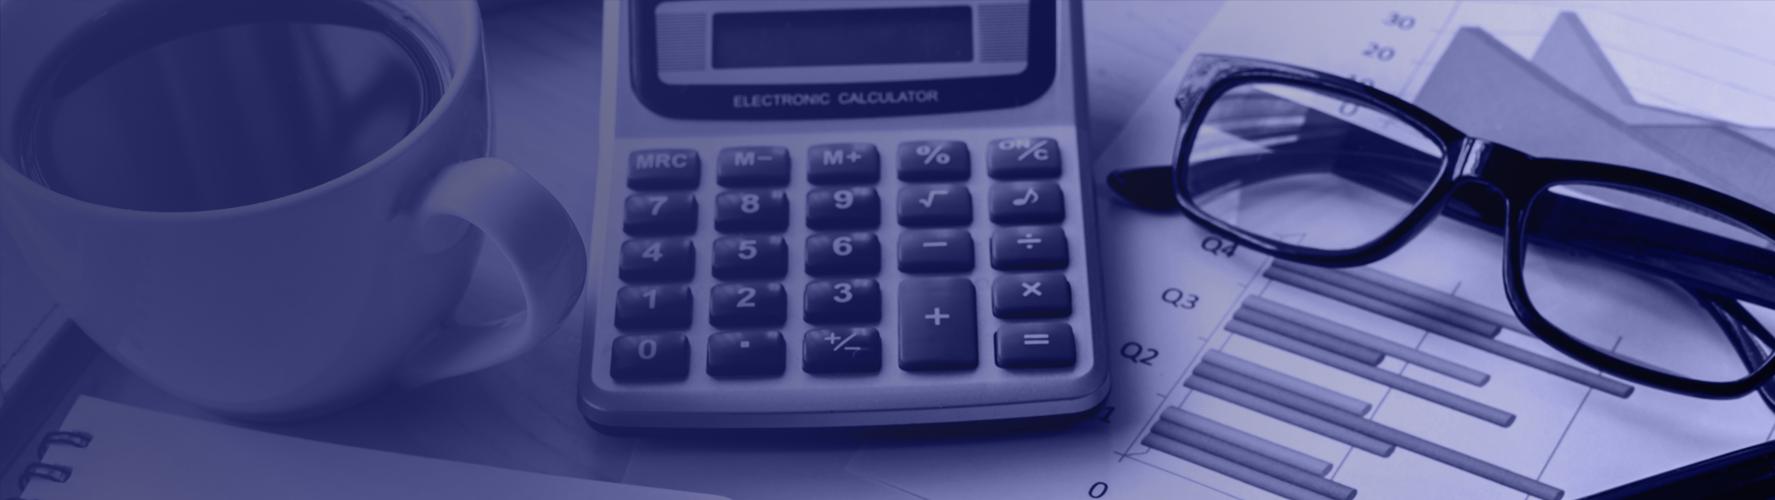 Calculator Library